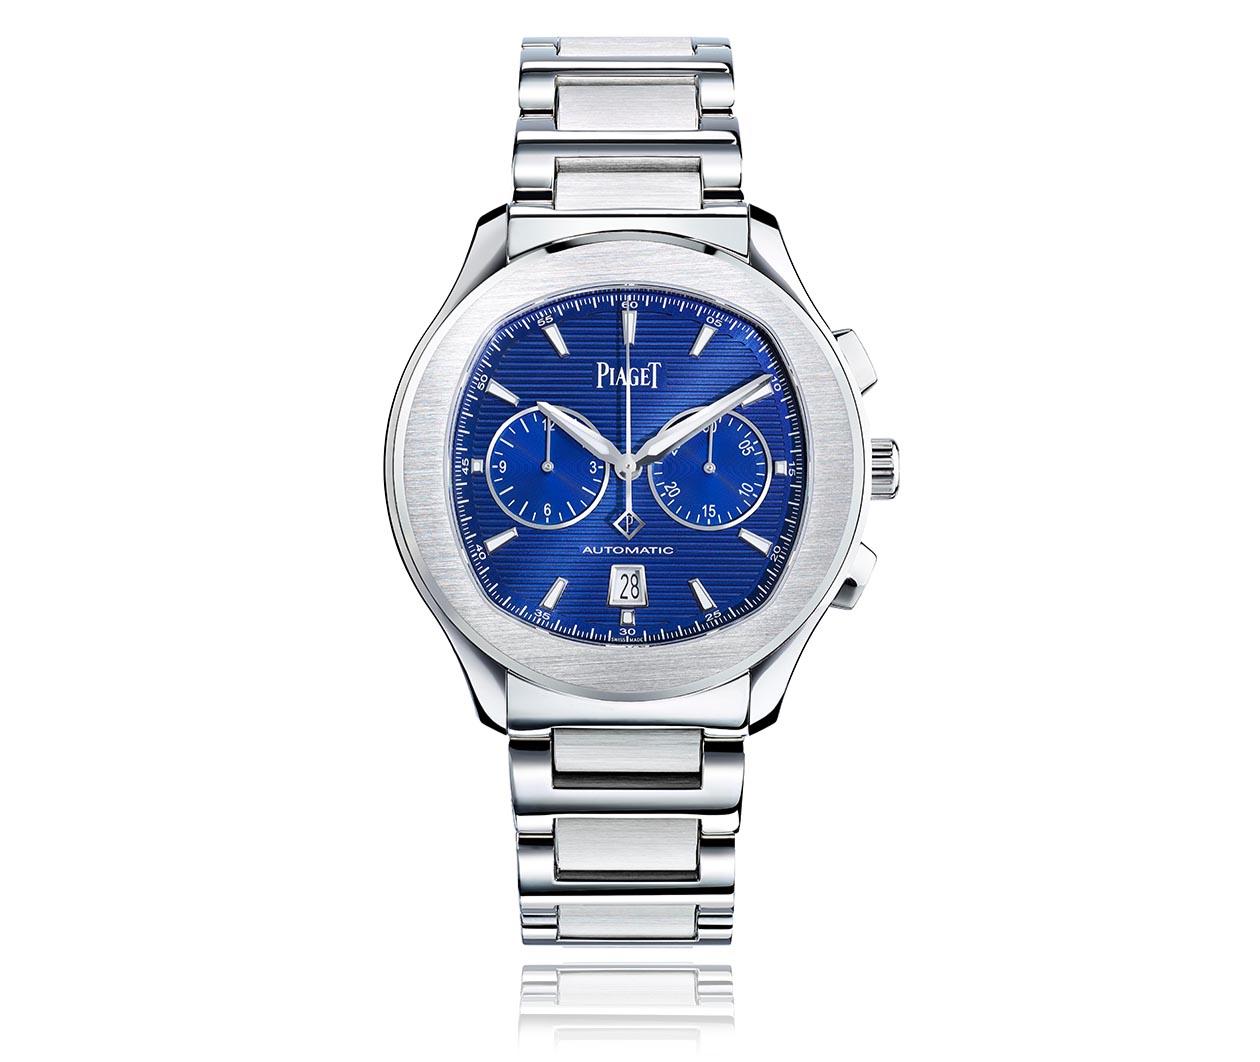 Piaget Polo watch G0A41006 Carousel 1 FINAL